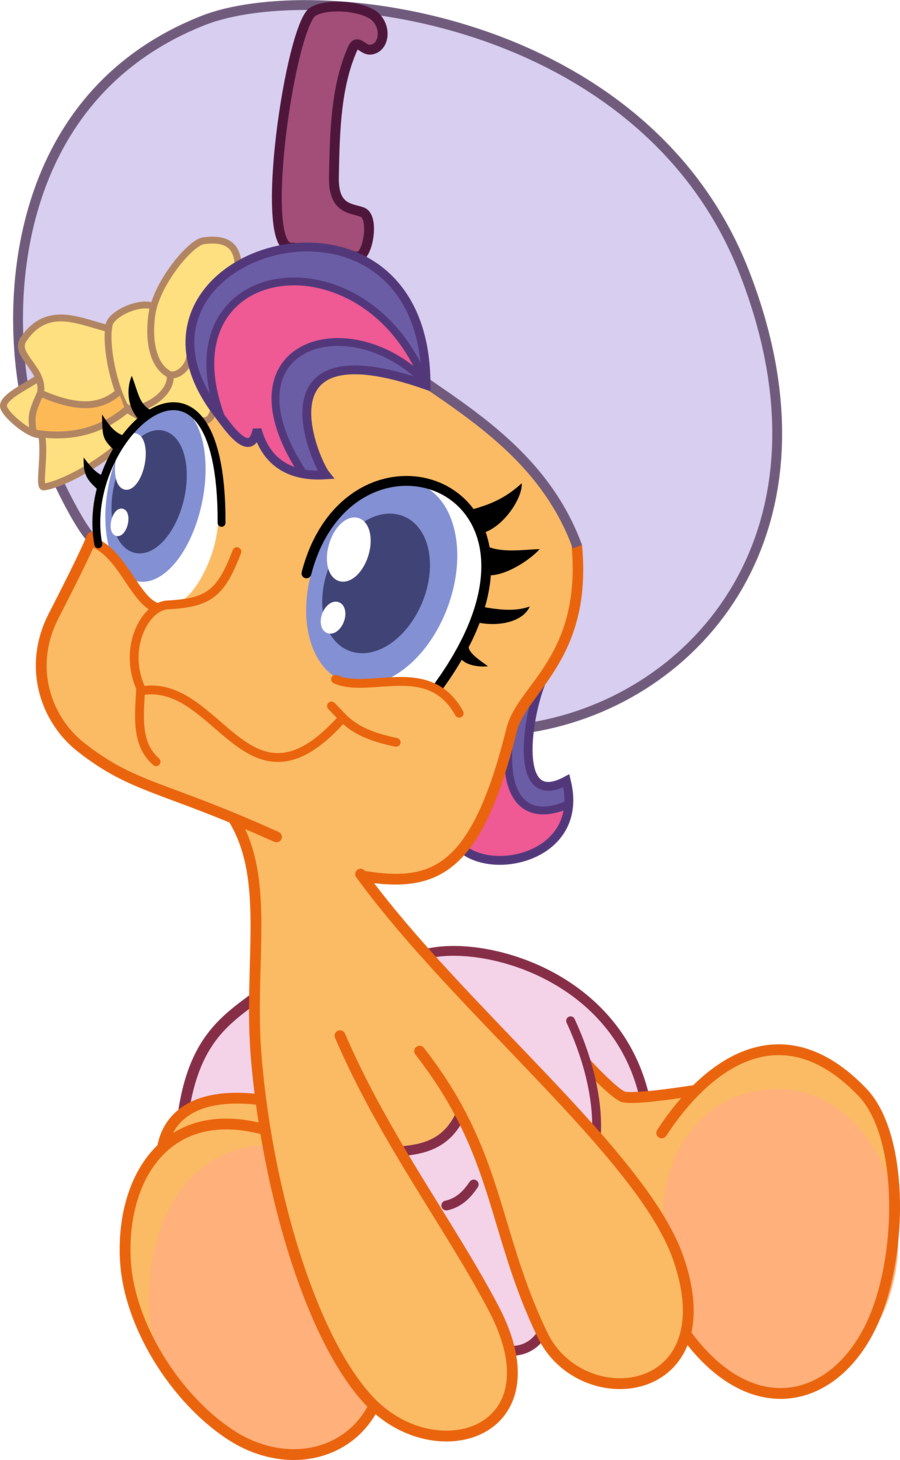 Baby Scootaloo Universe Of Smash Bros Lawl Wiki Fandom My little pony pop sweetie belle wild rainbow, scootaloo & apple bloom mlp maker playset set. universe of smash bros lawl wiki